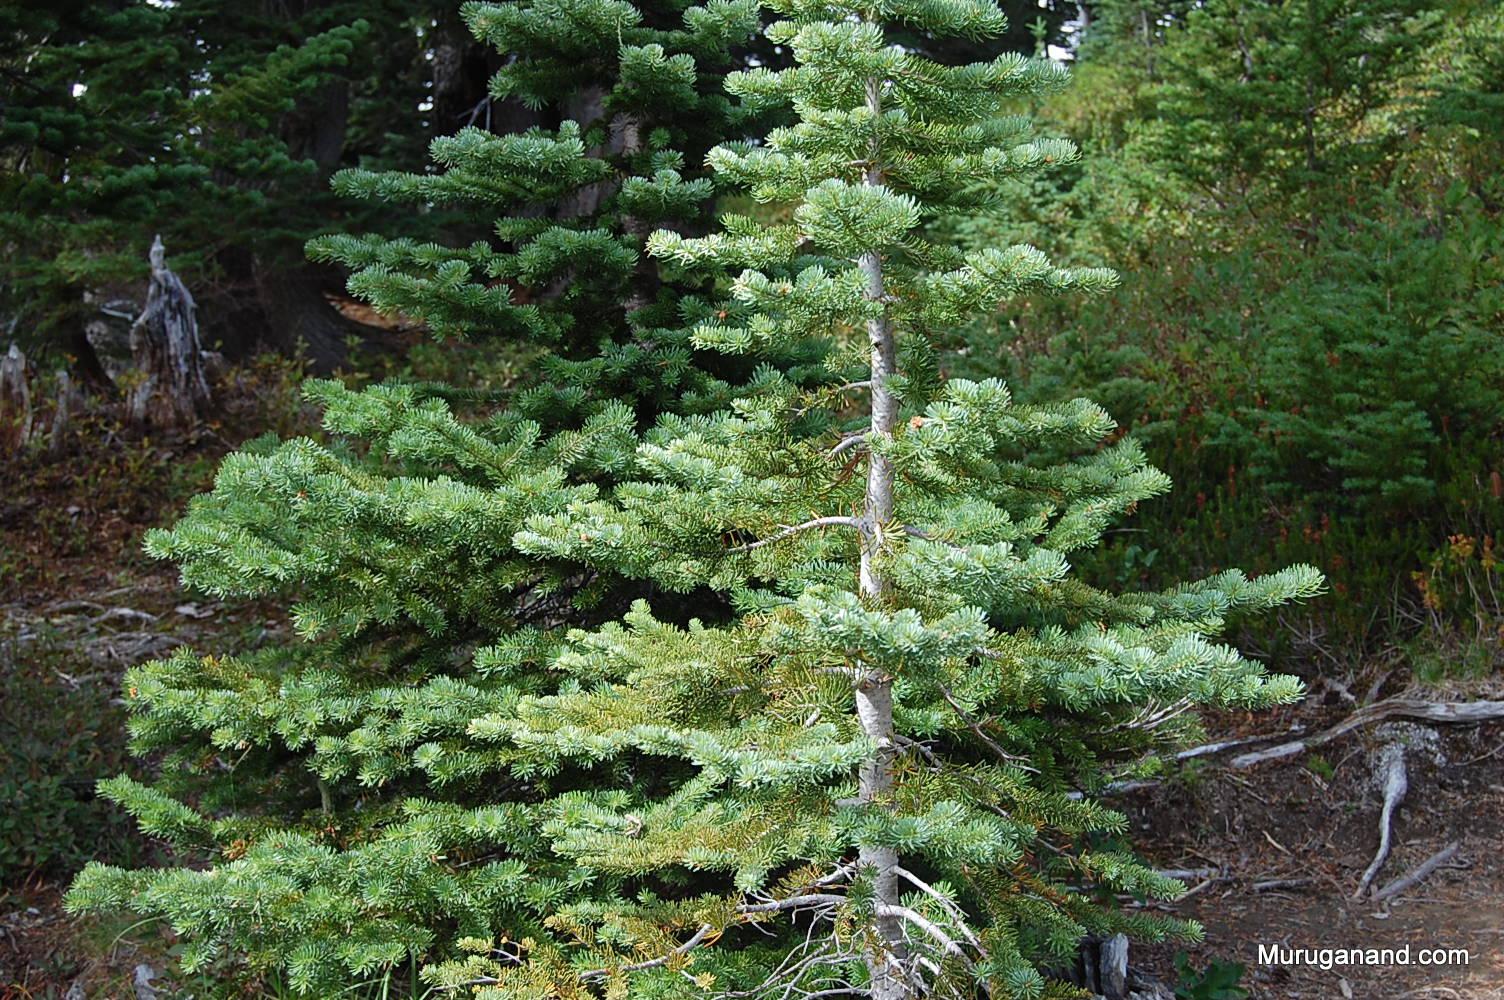 Close up of the sub-alpine fir